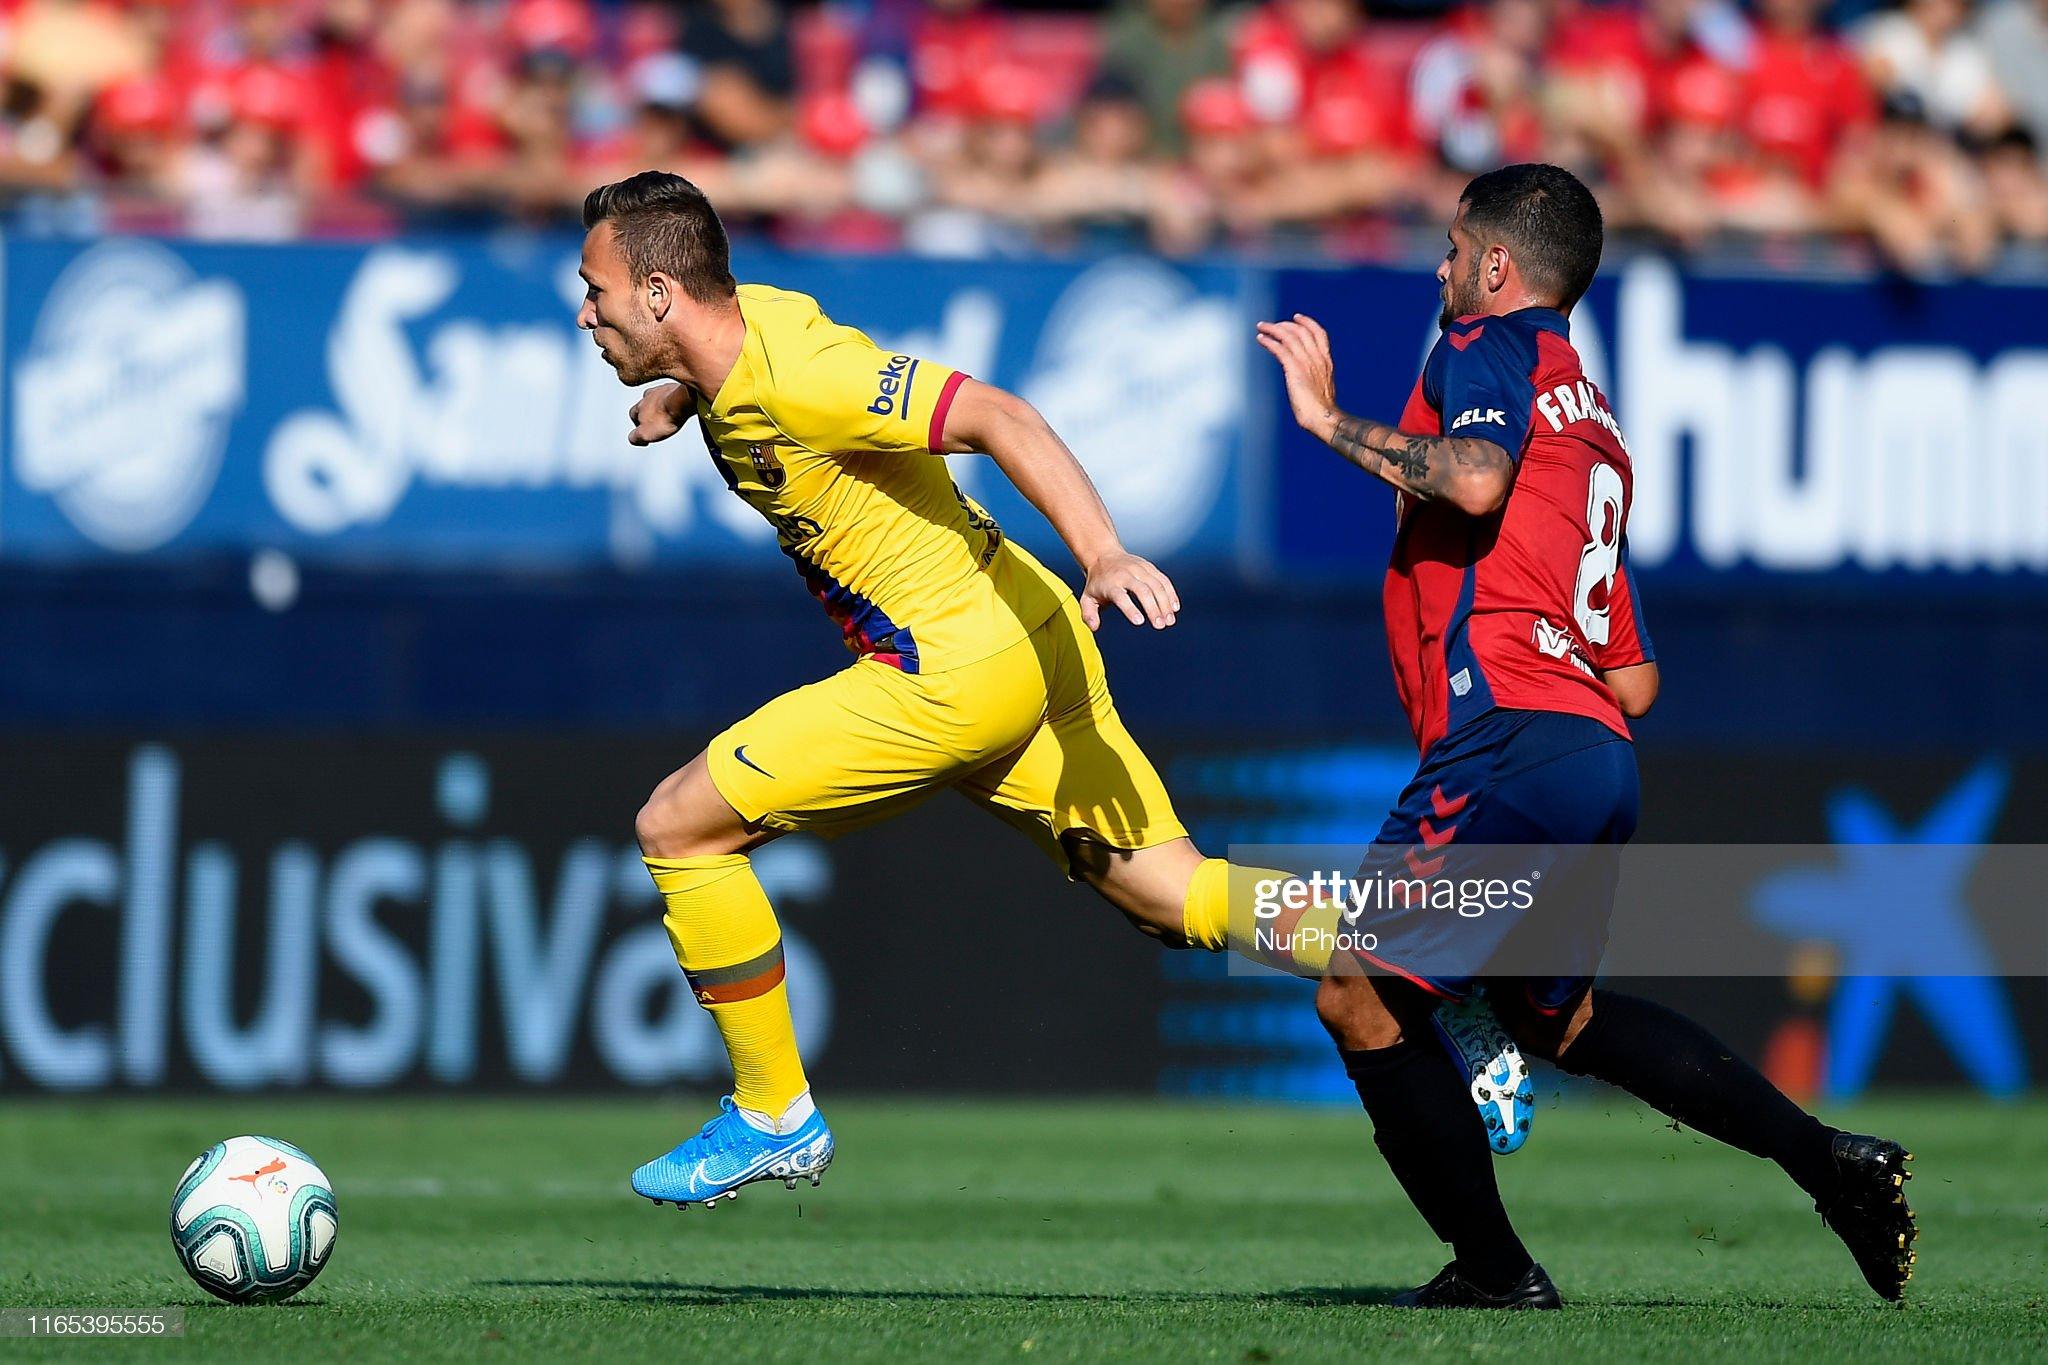 صور مباراة : أوساسونا - برشلونة 2-2 ( 31-08-2019 )  Arthur-melo-of-barcelona-and-fran-merida-of-osasunacompetes-for-the-picture-id1165395555?s=2048x2048